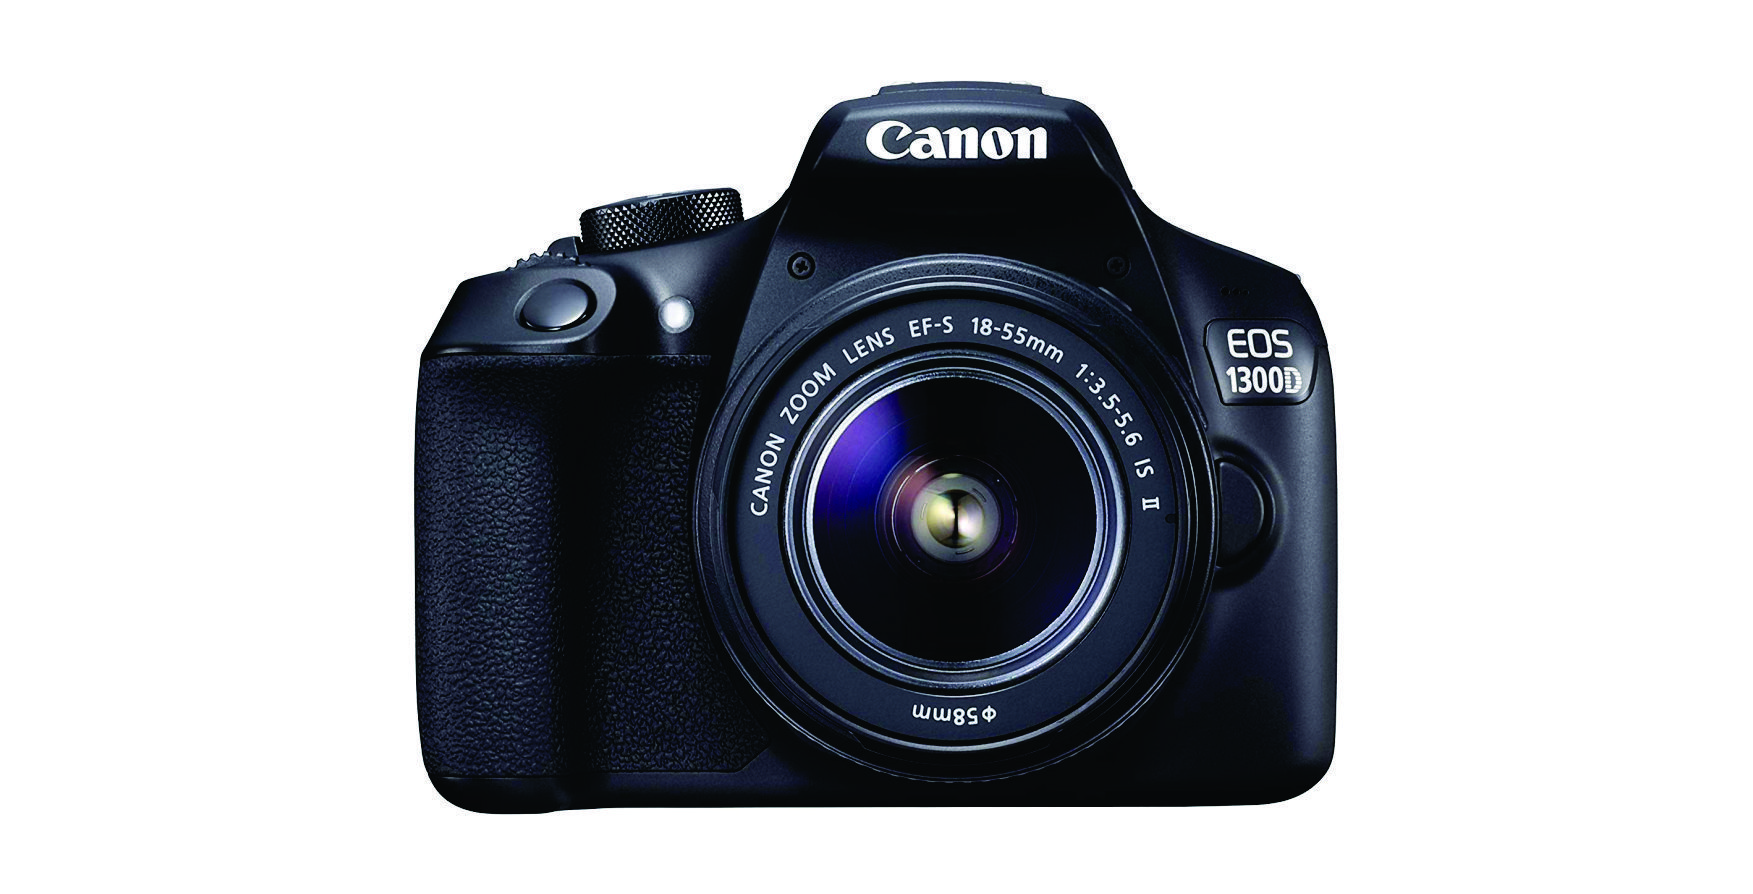 Canon eos 1300d 18mp digital dslr camera dslr dslr